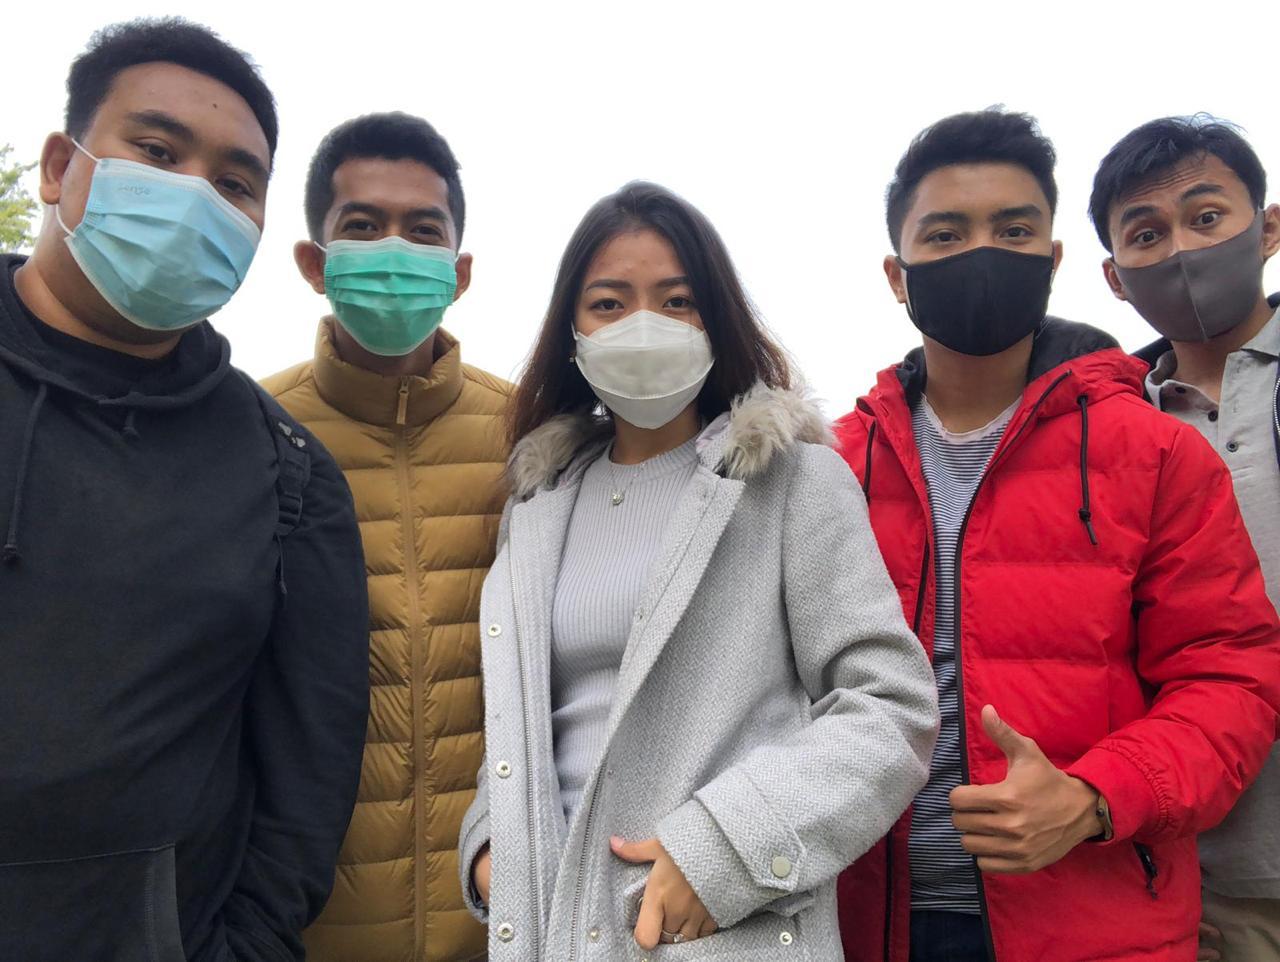 Mahasiswa Matrappar Politeknik Negeri Bali yang mulai perkuliahan di Angers University, Perancis (dari kiri) Angga, Hendra, Kezia, Rian, Gobit. Foto:Ist